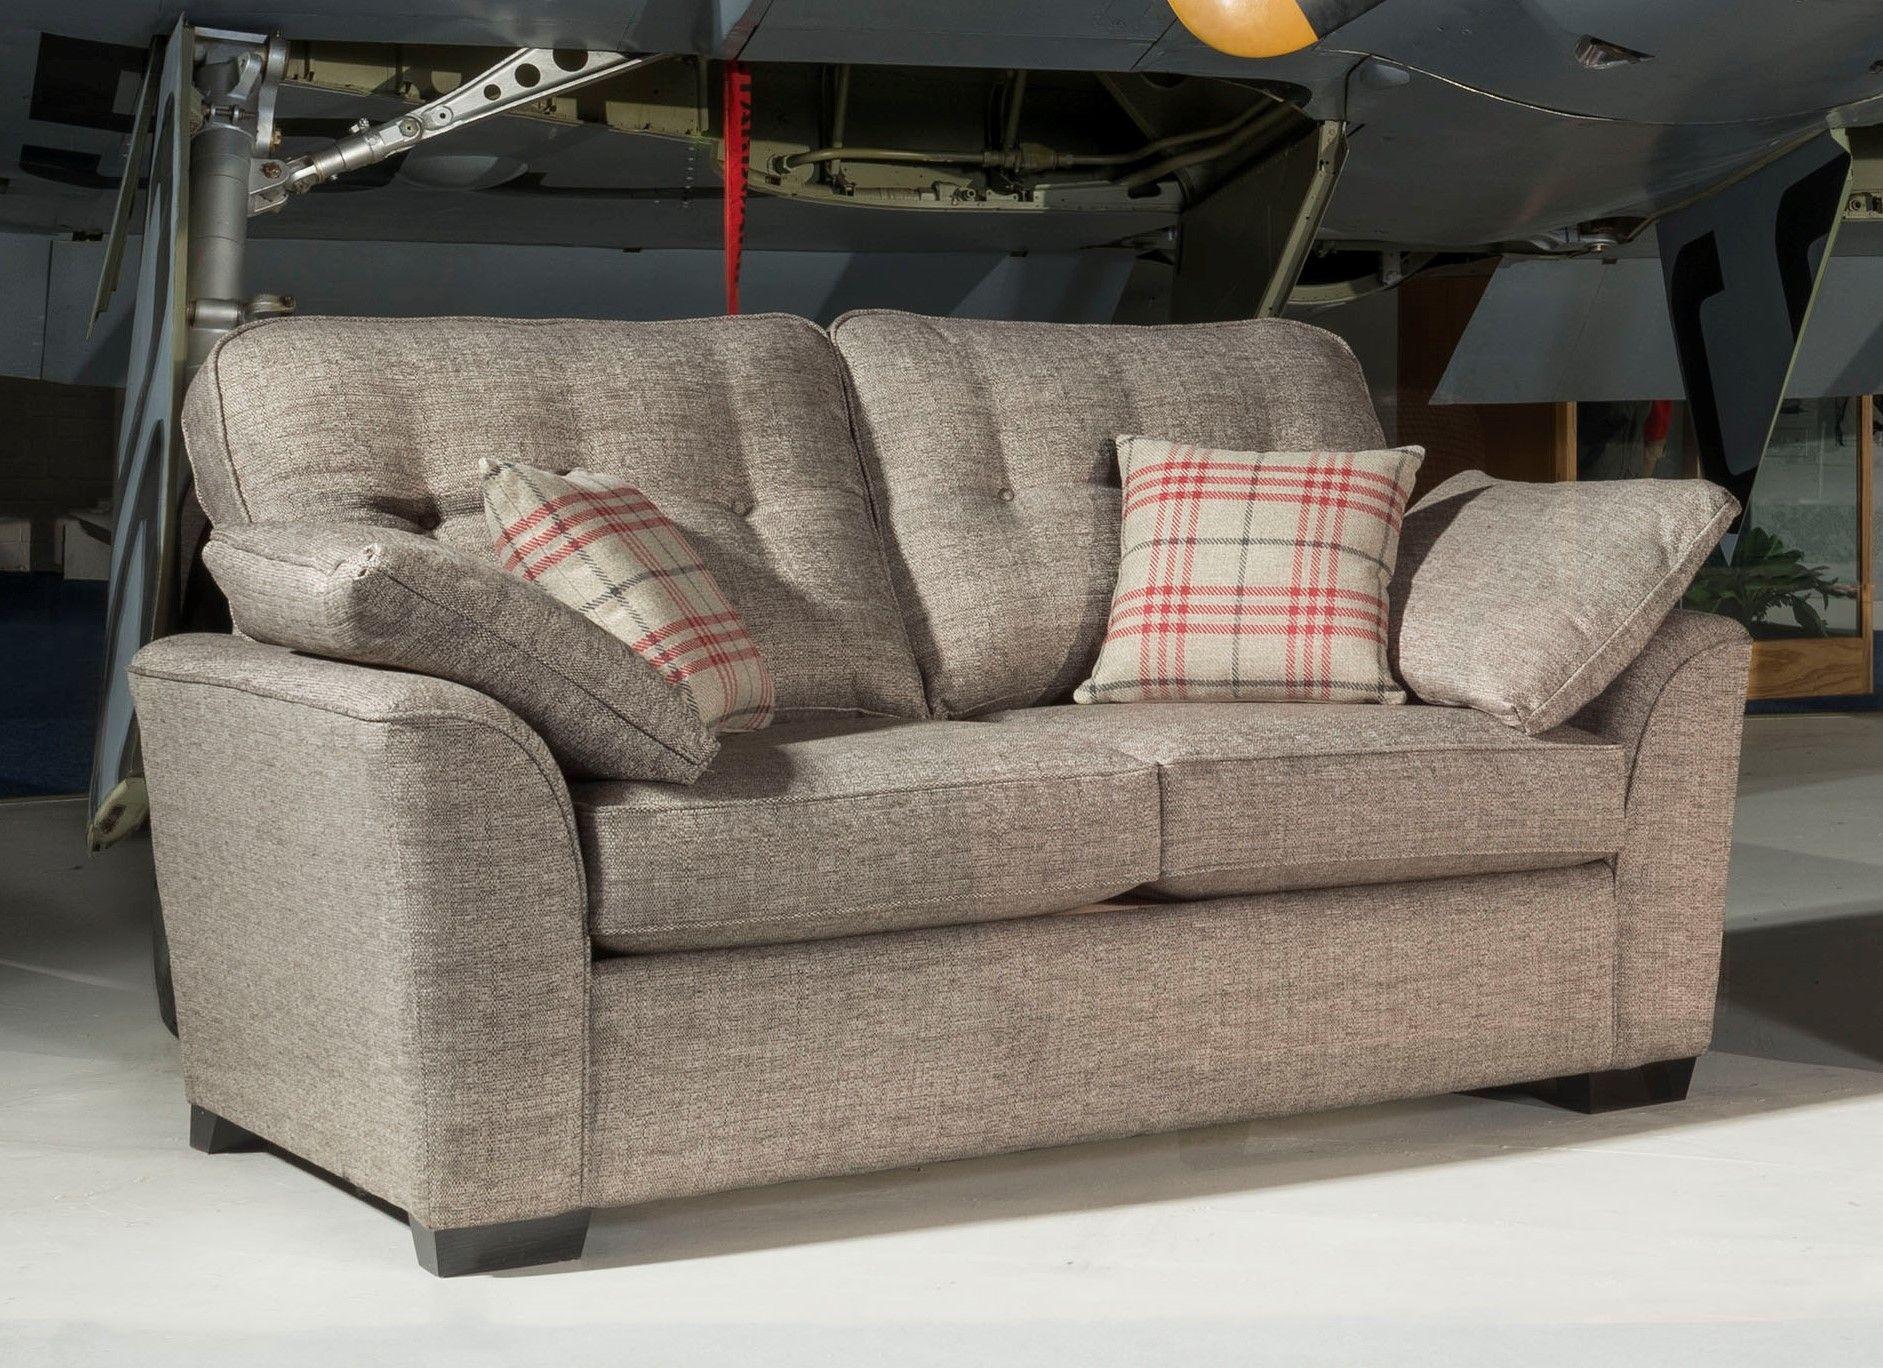 sofa beds naples florida kirkland dog bed uk alstons tempest 3 seater medium sofas living homes